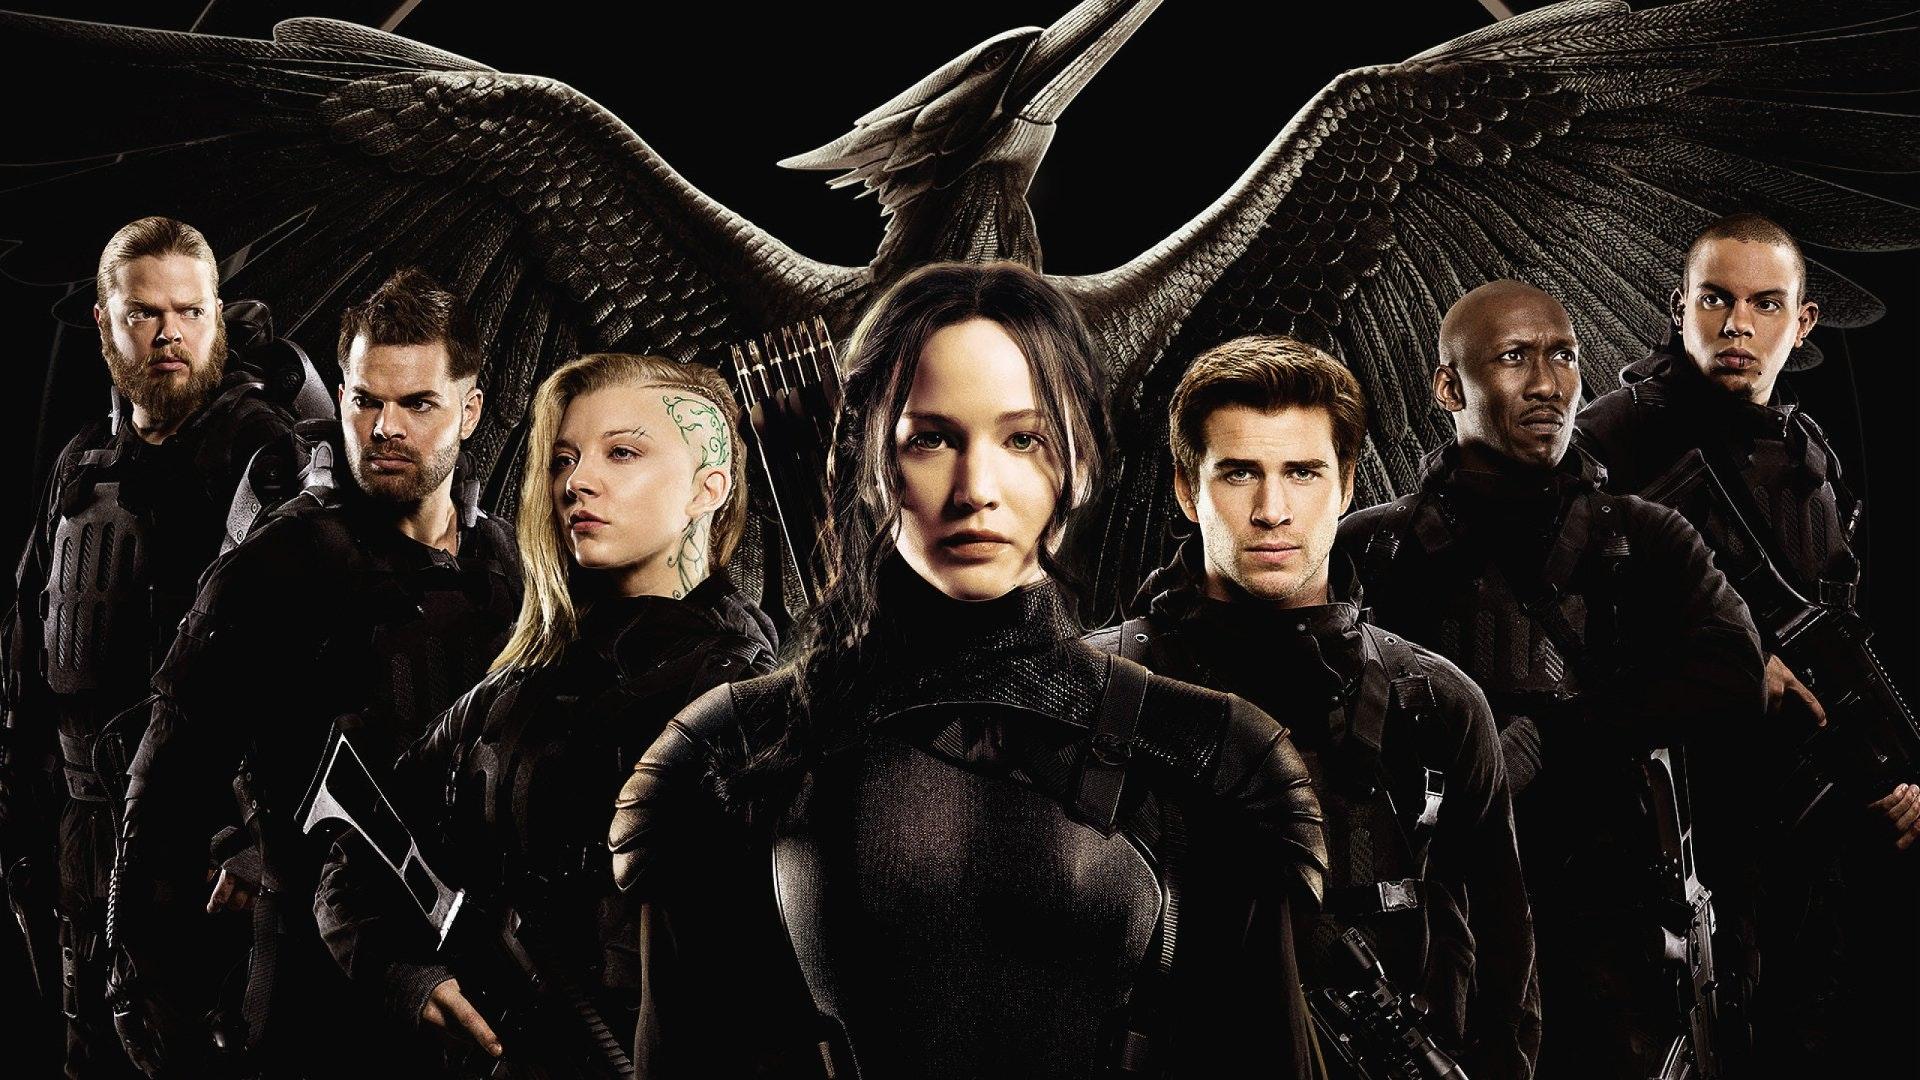 The Hunger Games: Mockingjay Part I Soundtrack